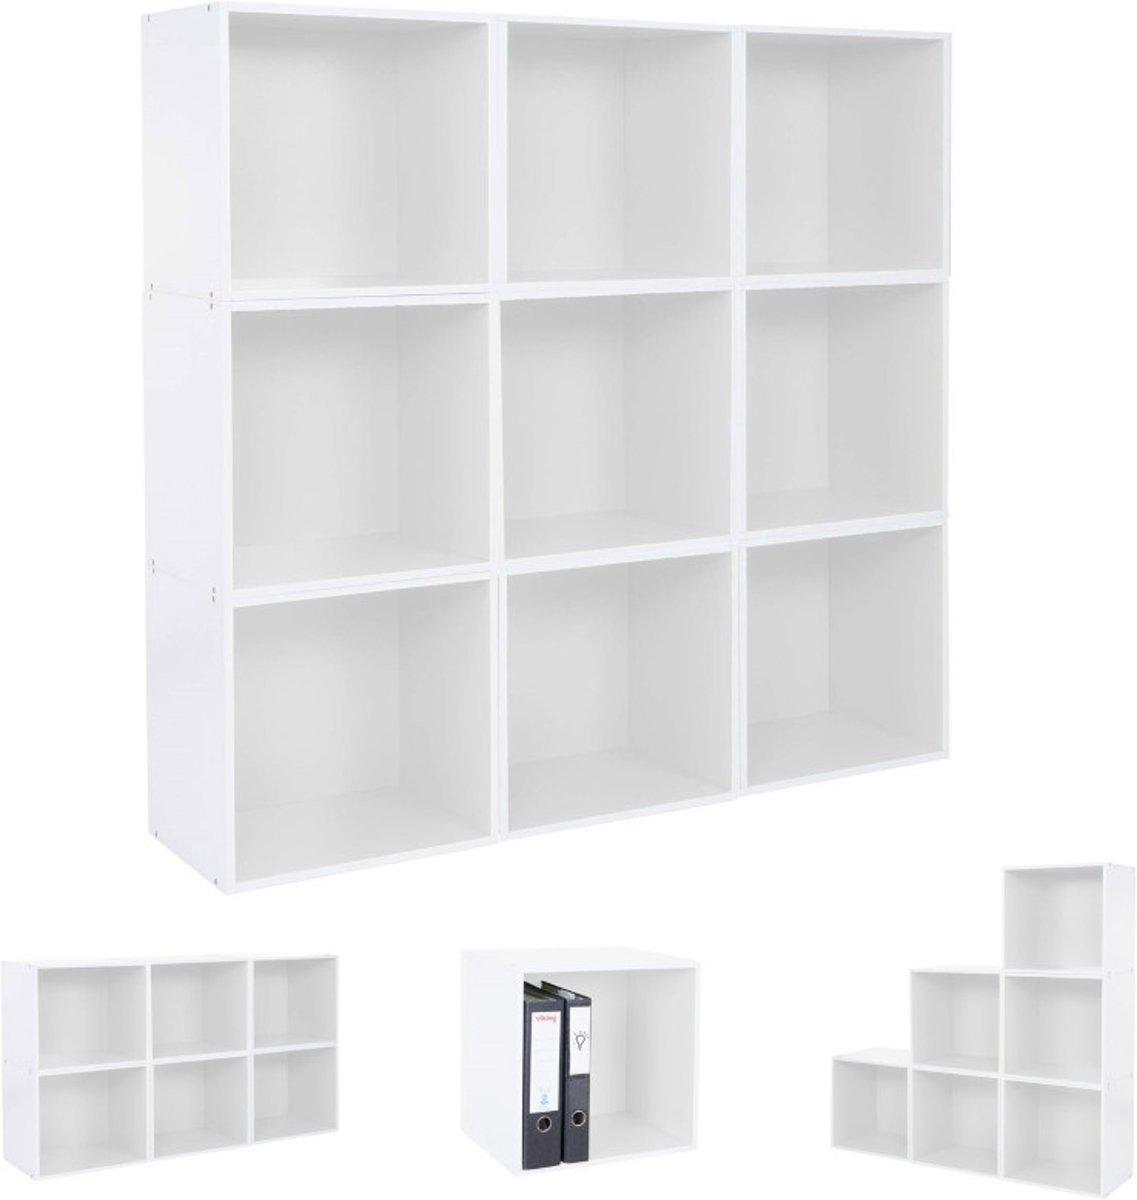 Bolcom Boekenkast Kast Vierkant Cube Shelf Boekenkast